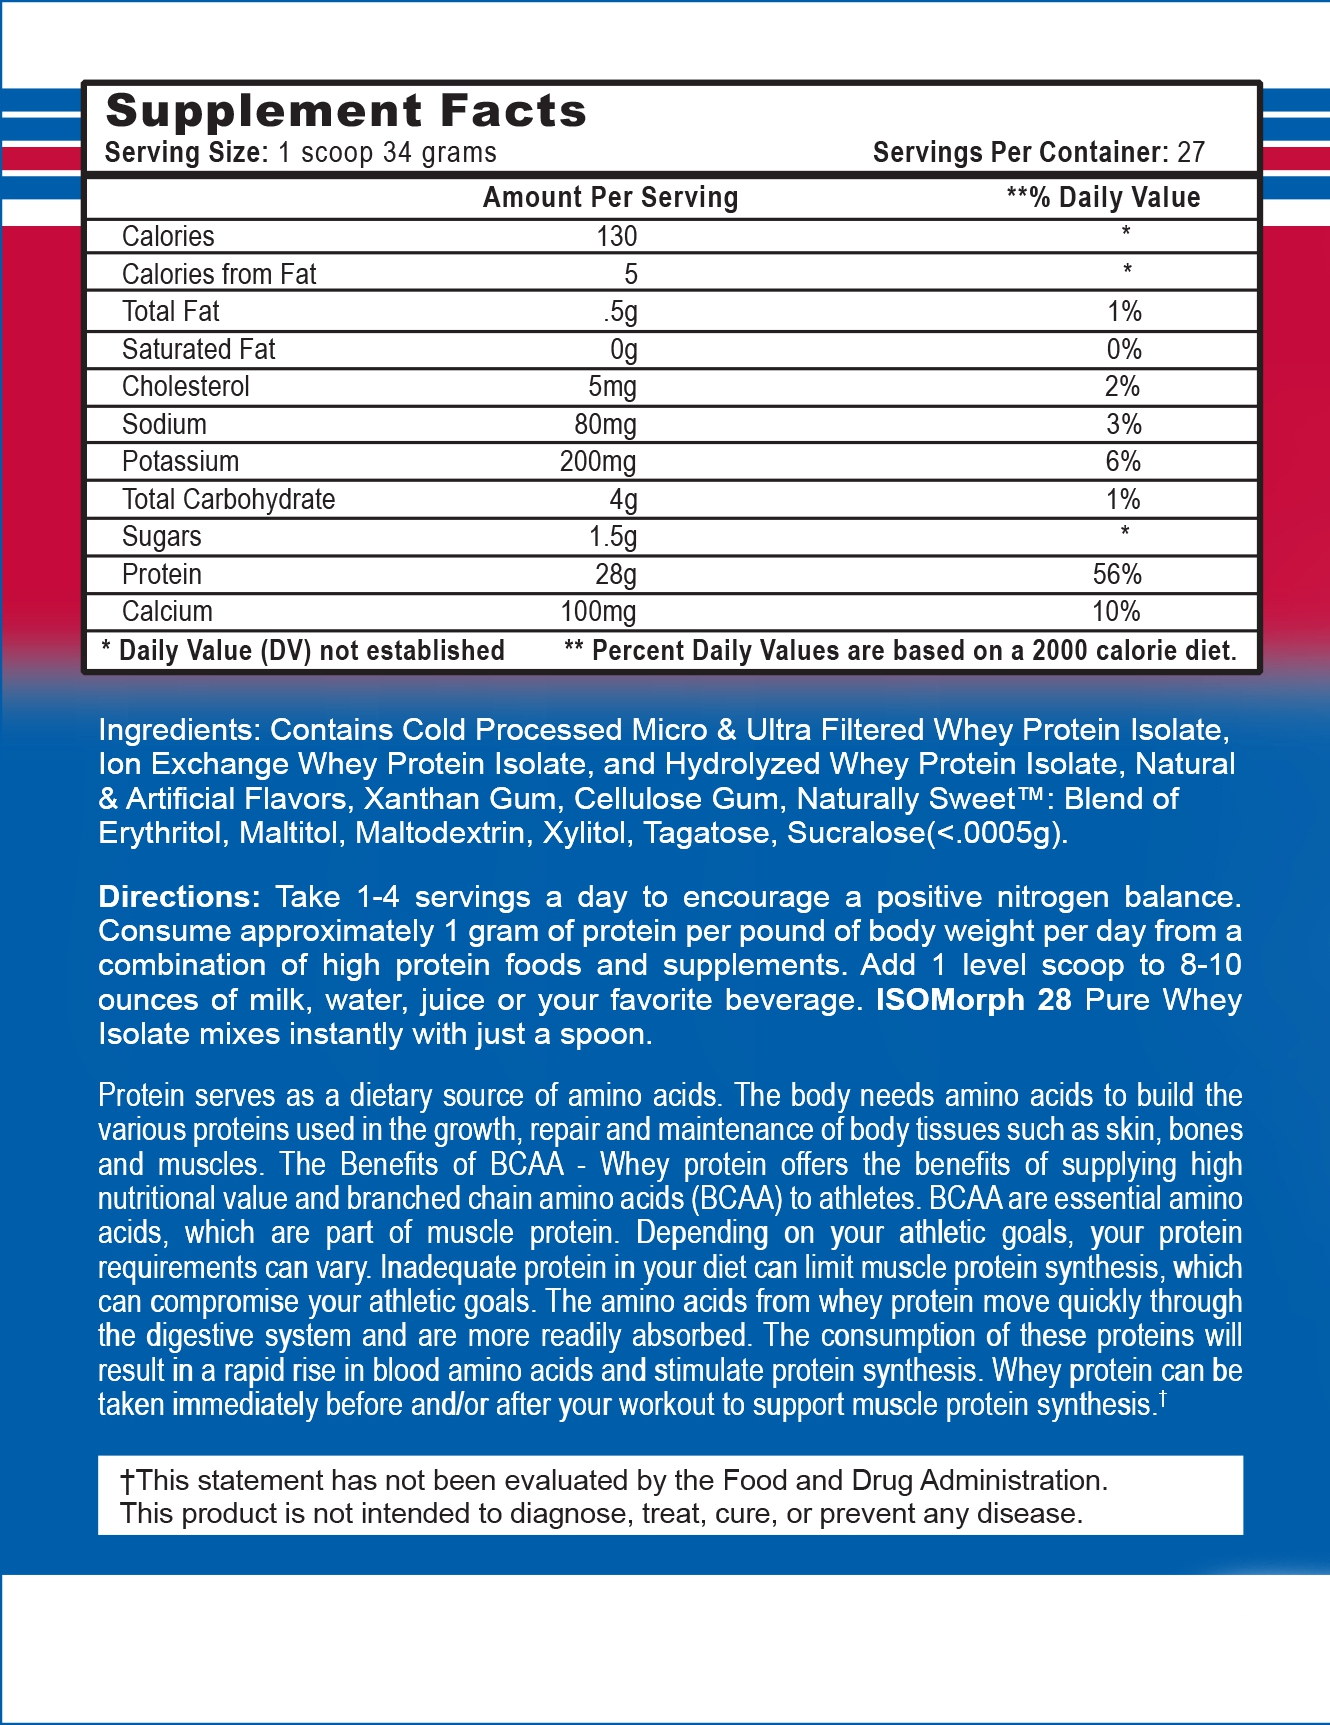 Isomorph supplement facts